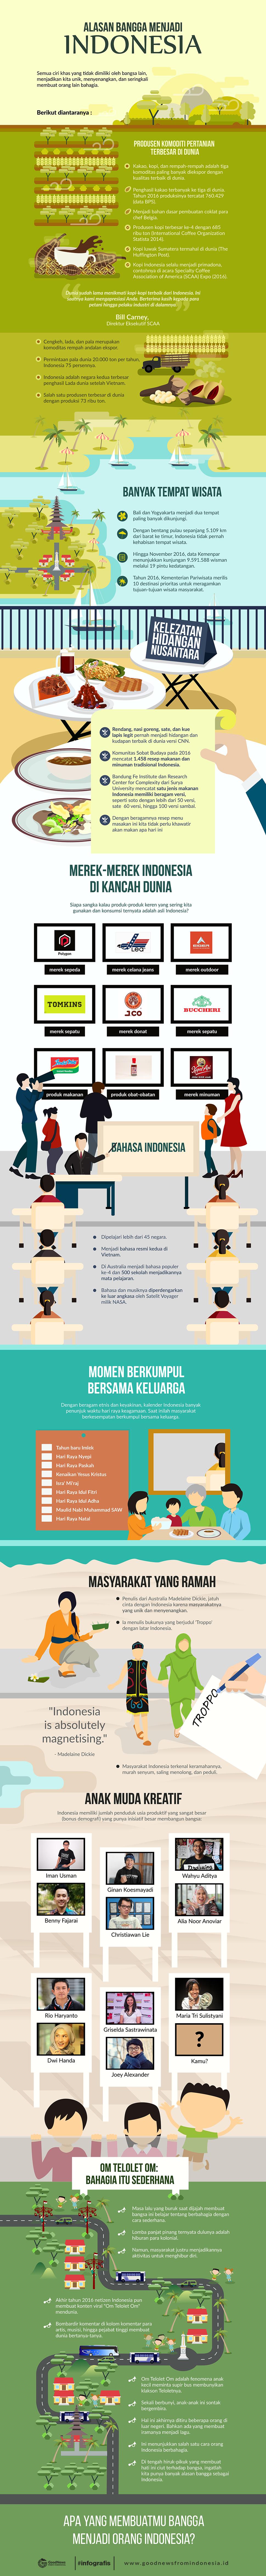 Alasan Bangga Menjadi Indonesia